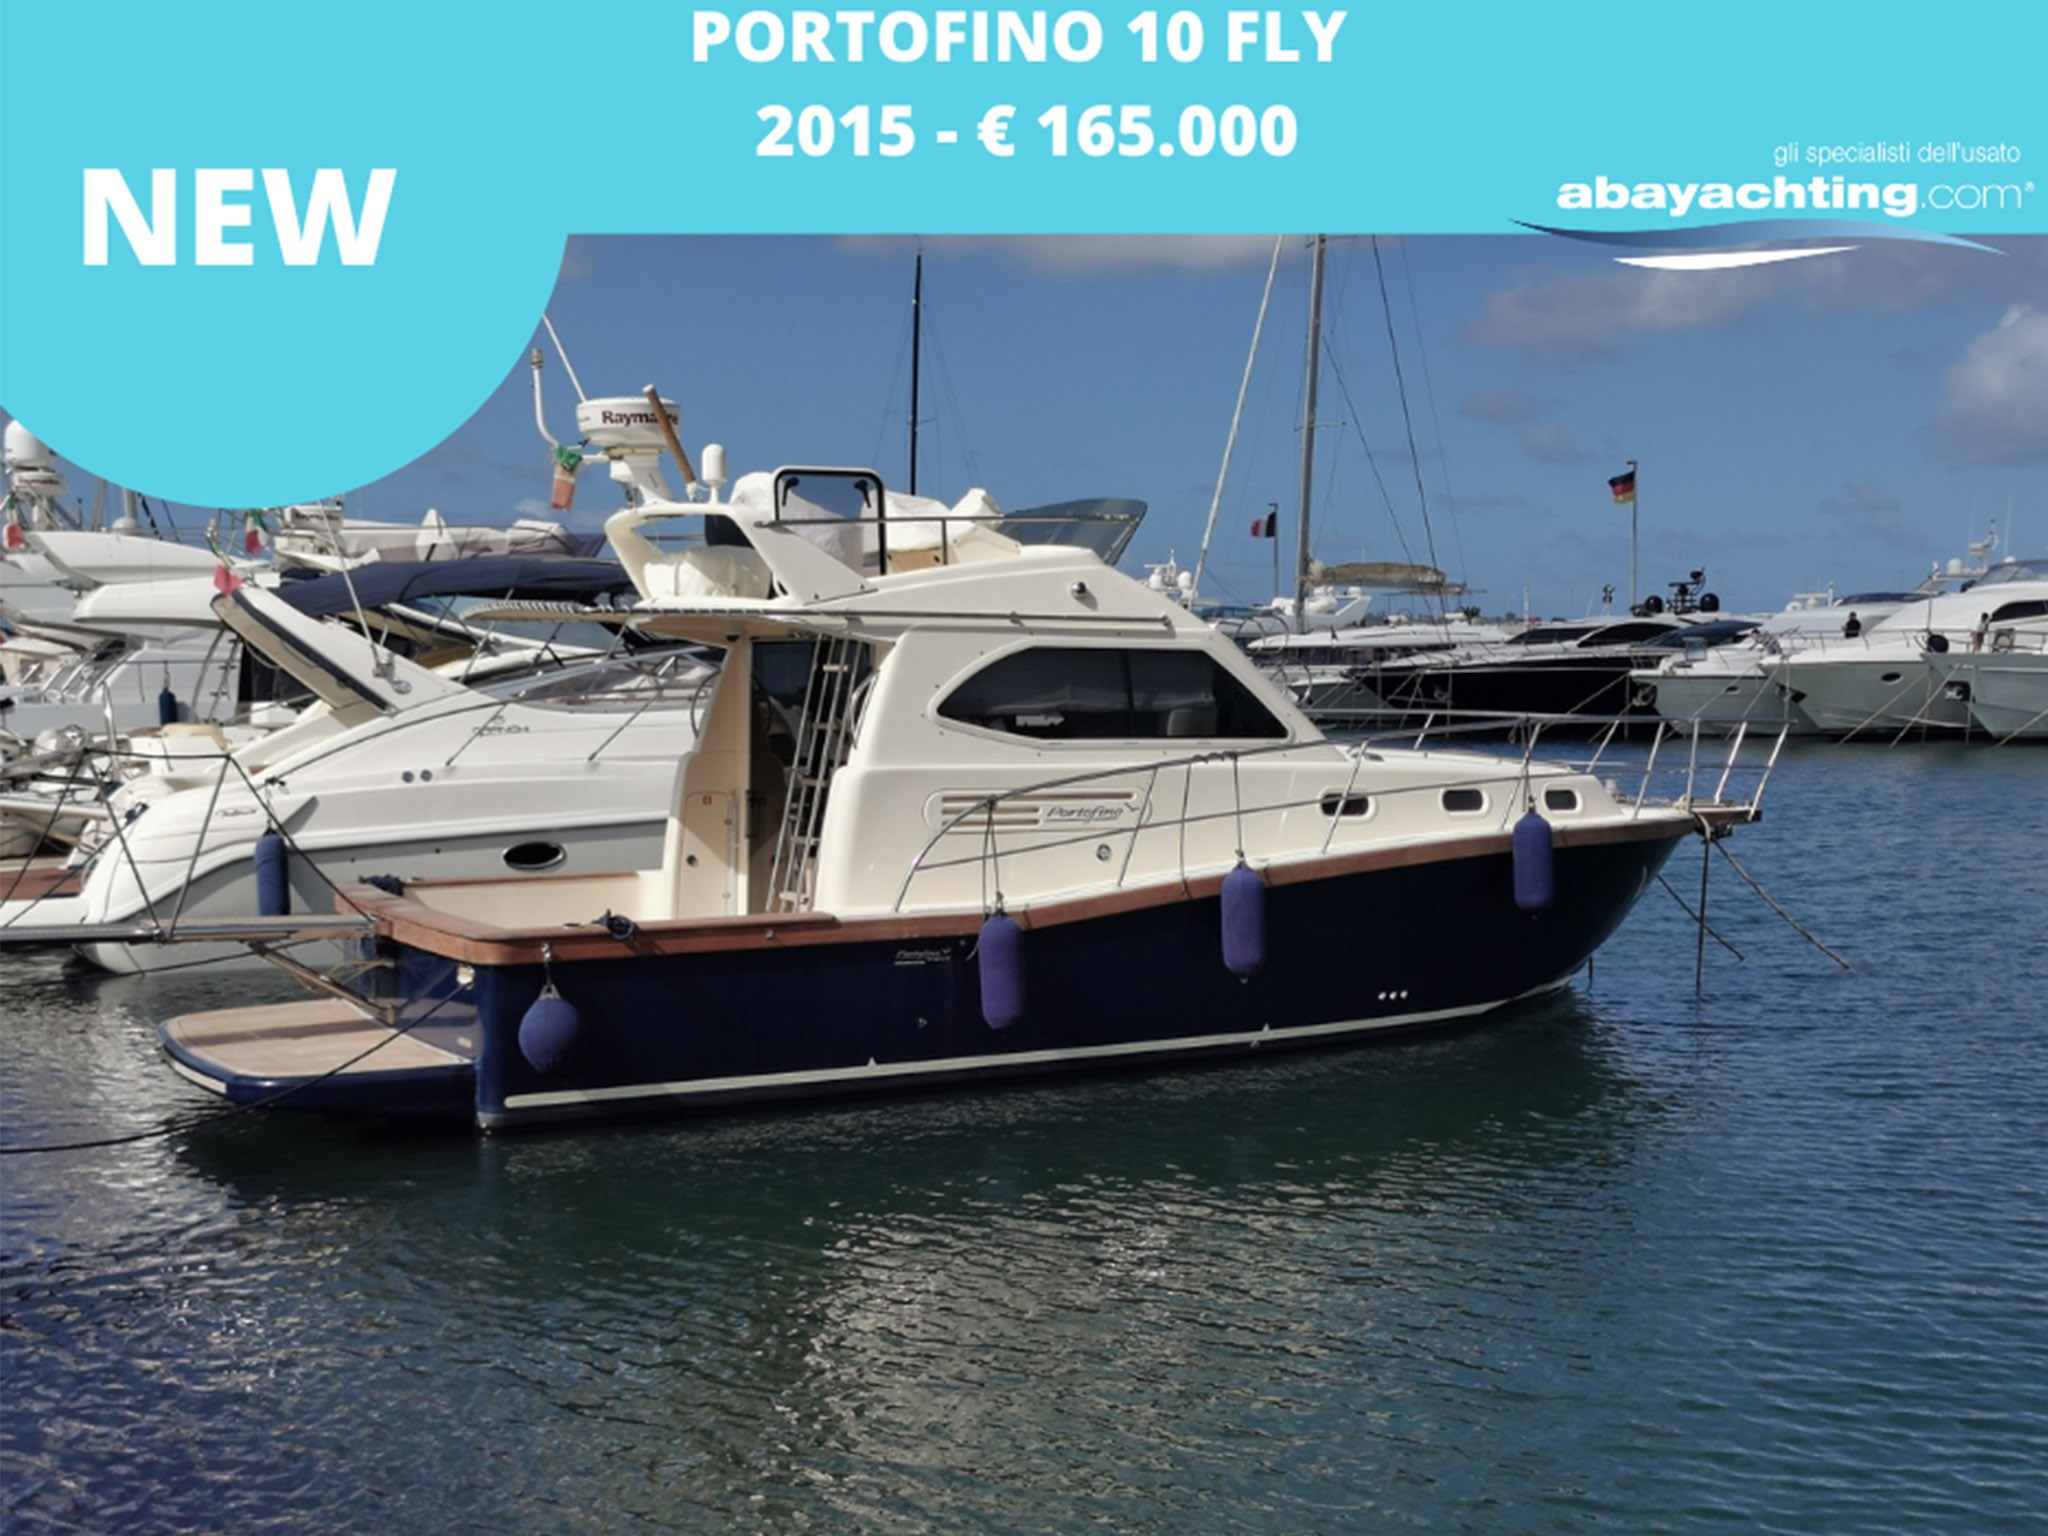 New arrival Portofino 10 Fly